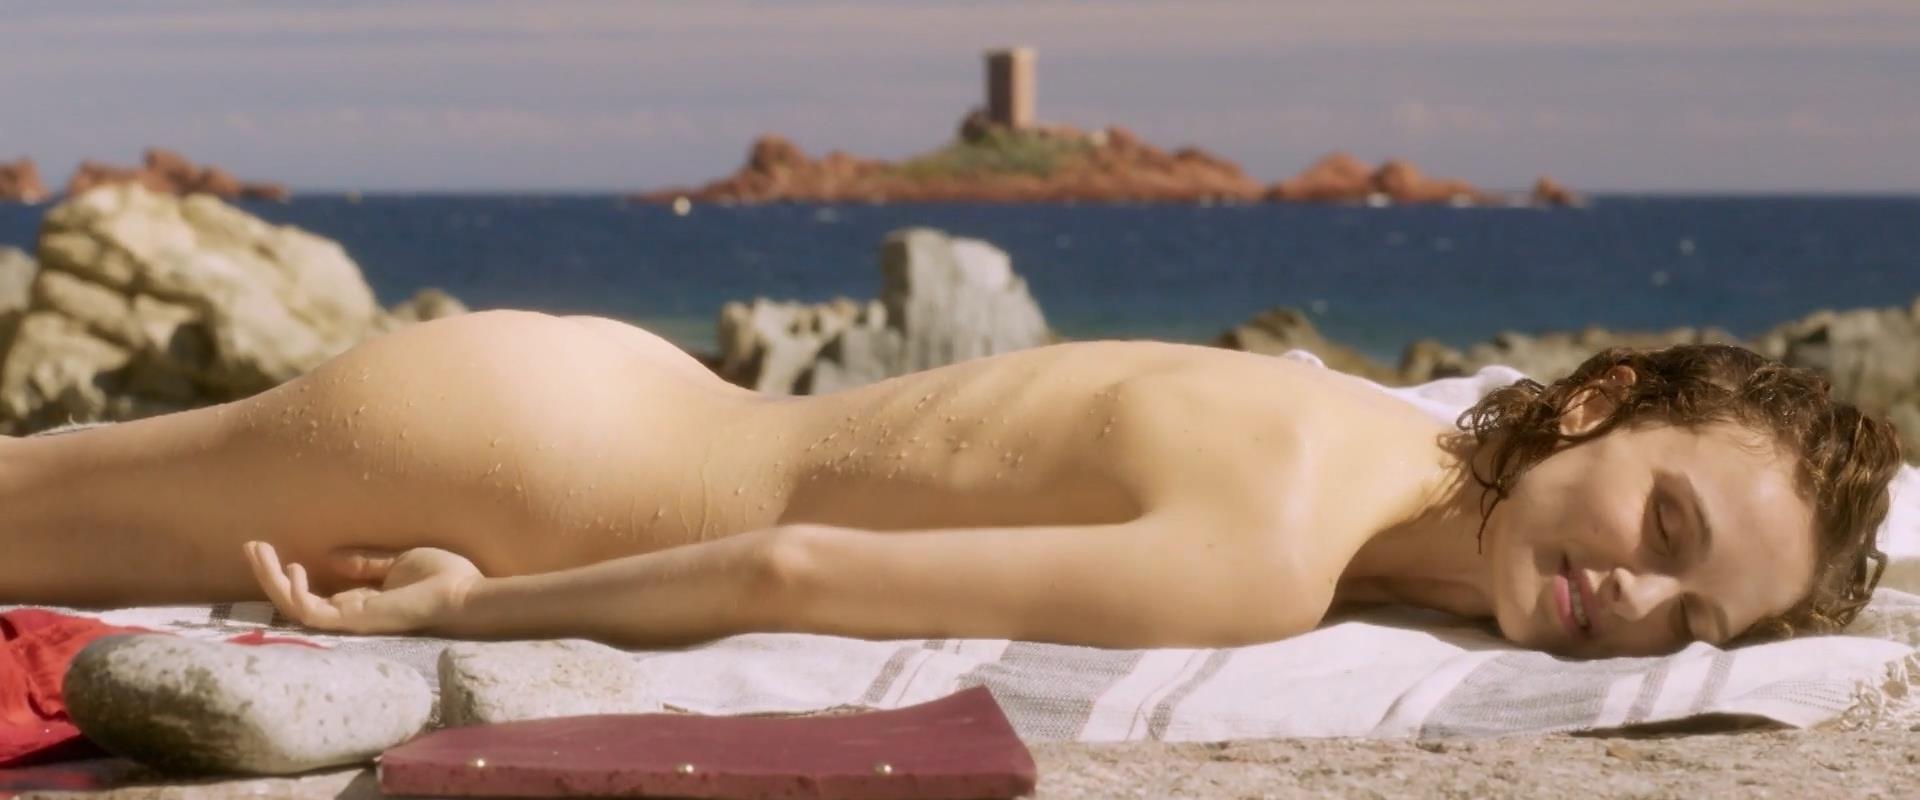 Boobs Portman Naked Video Photos